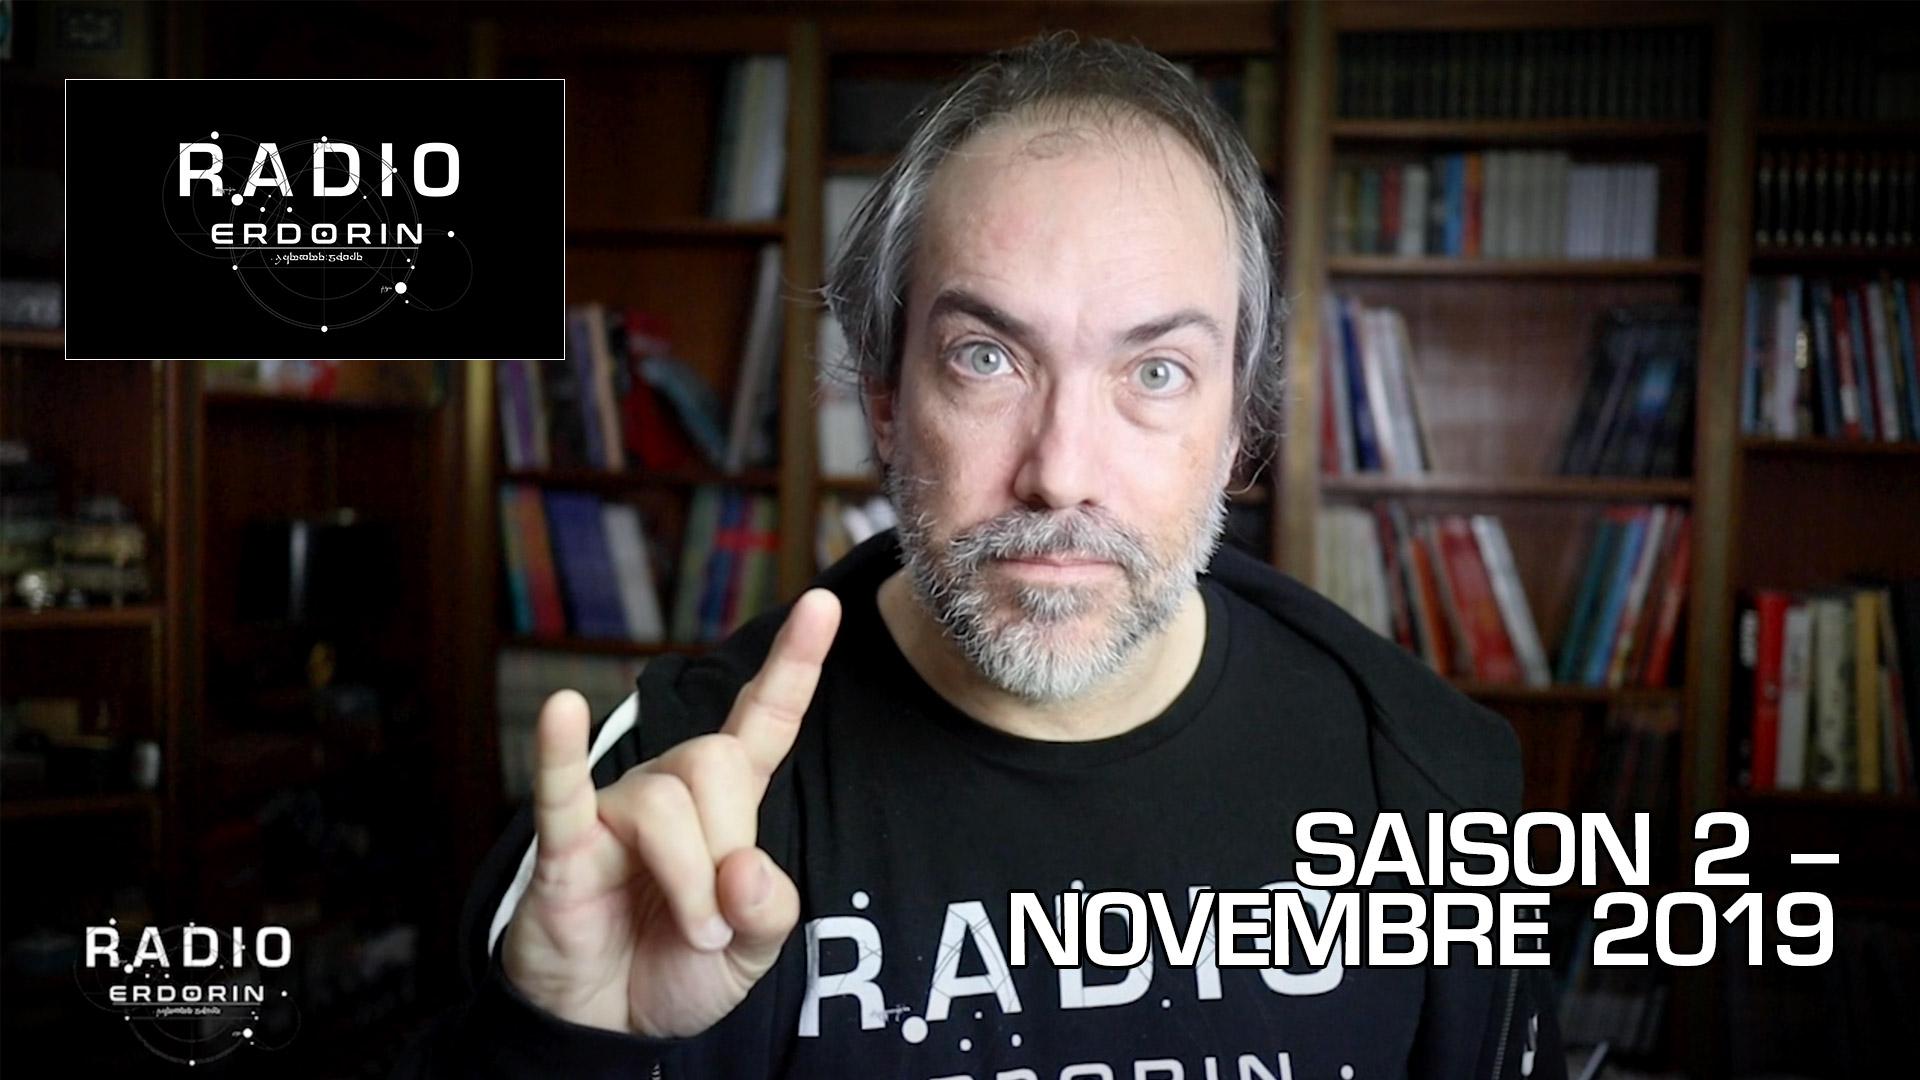 Radio-Erdorin S2E11 – Novembre 2019